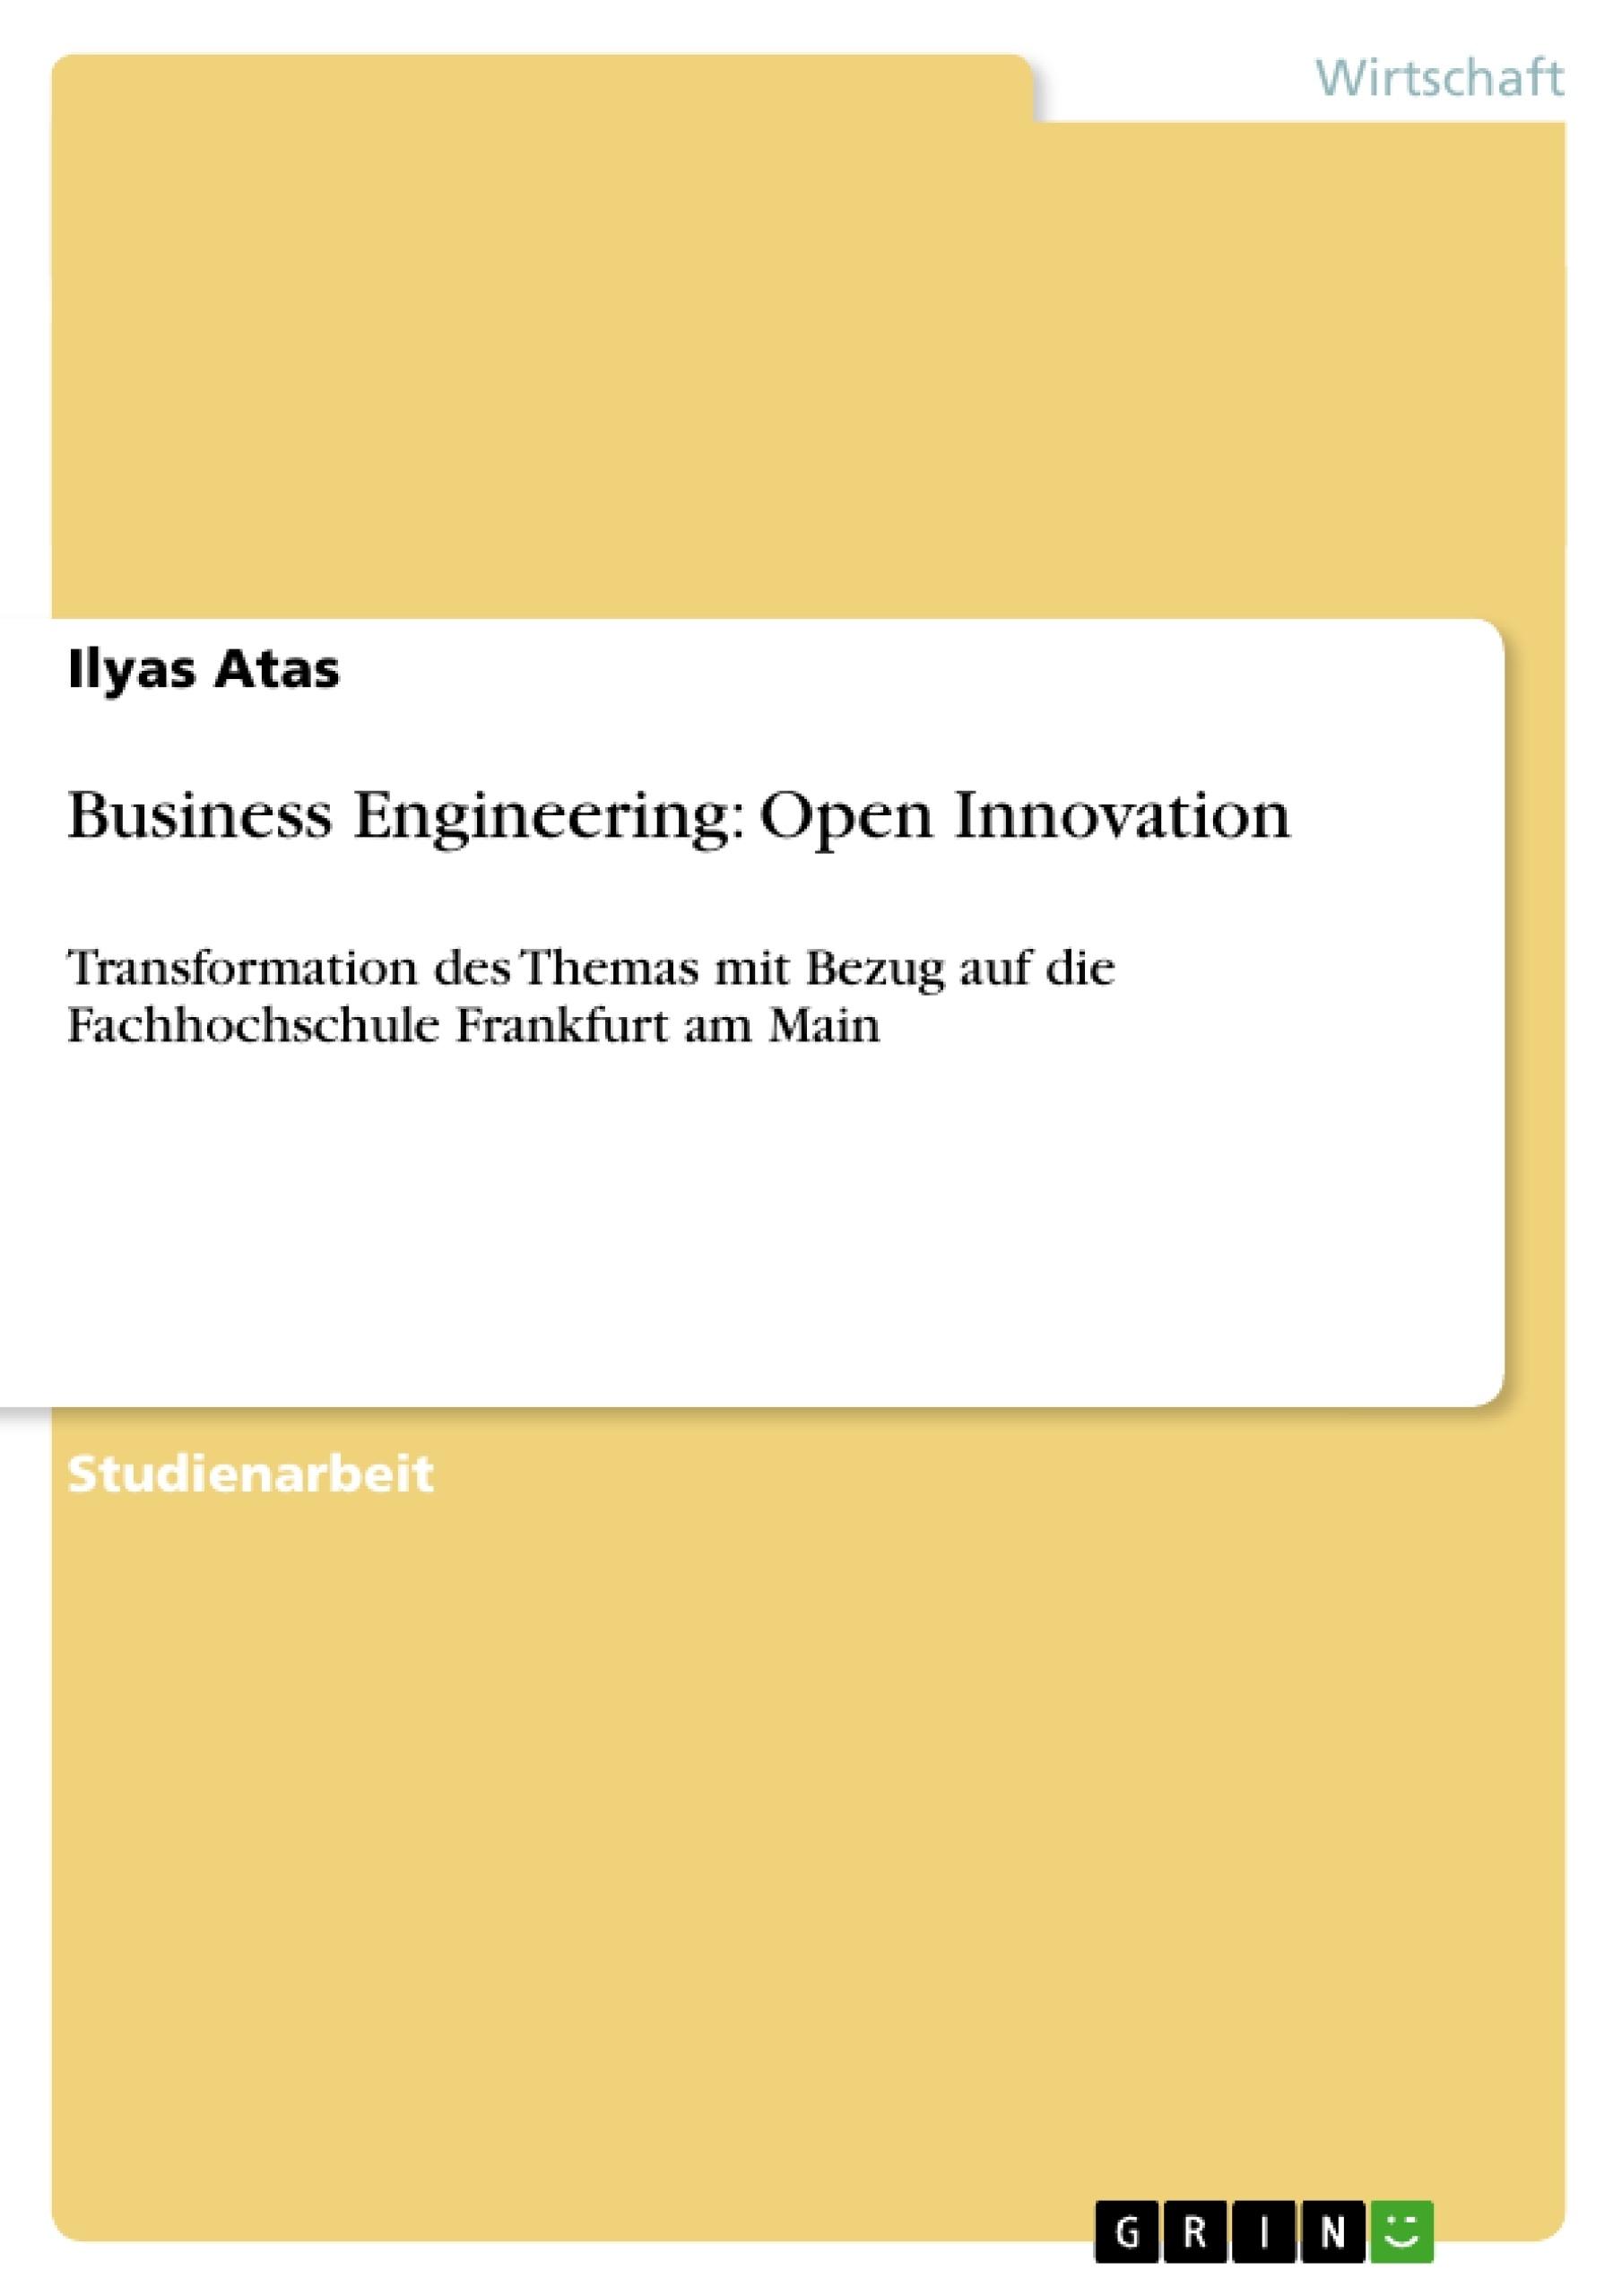 Titel: Business Engineering: Open Innovation